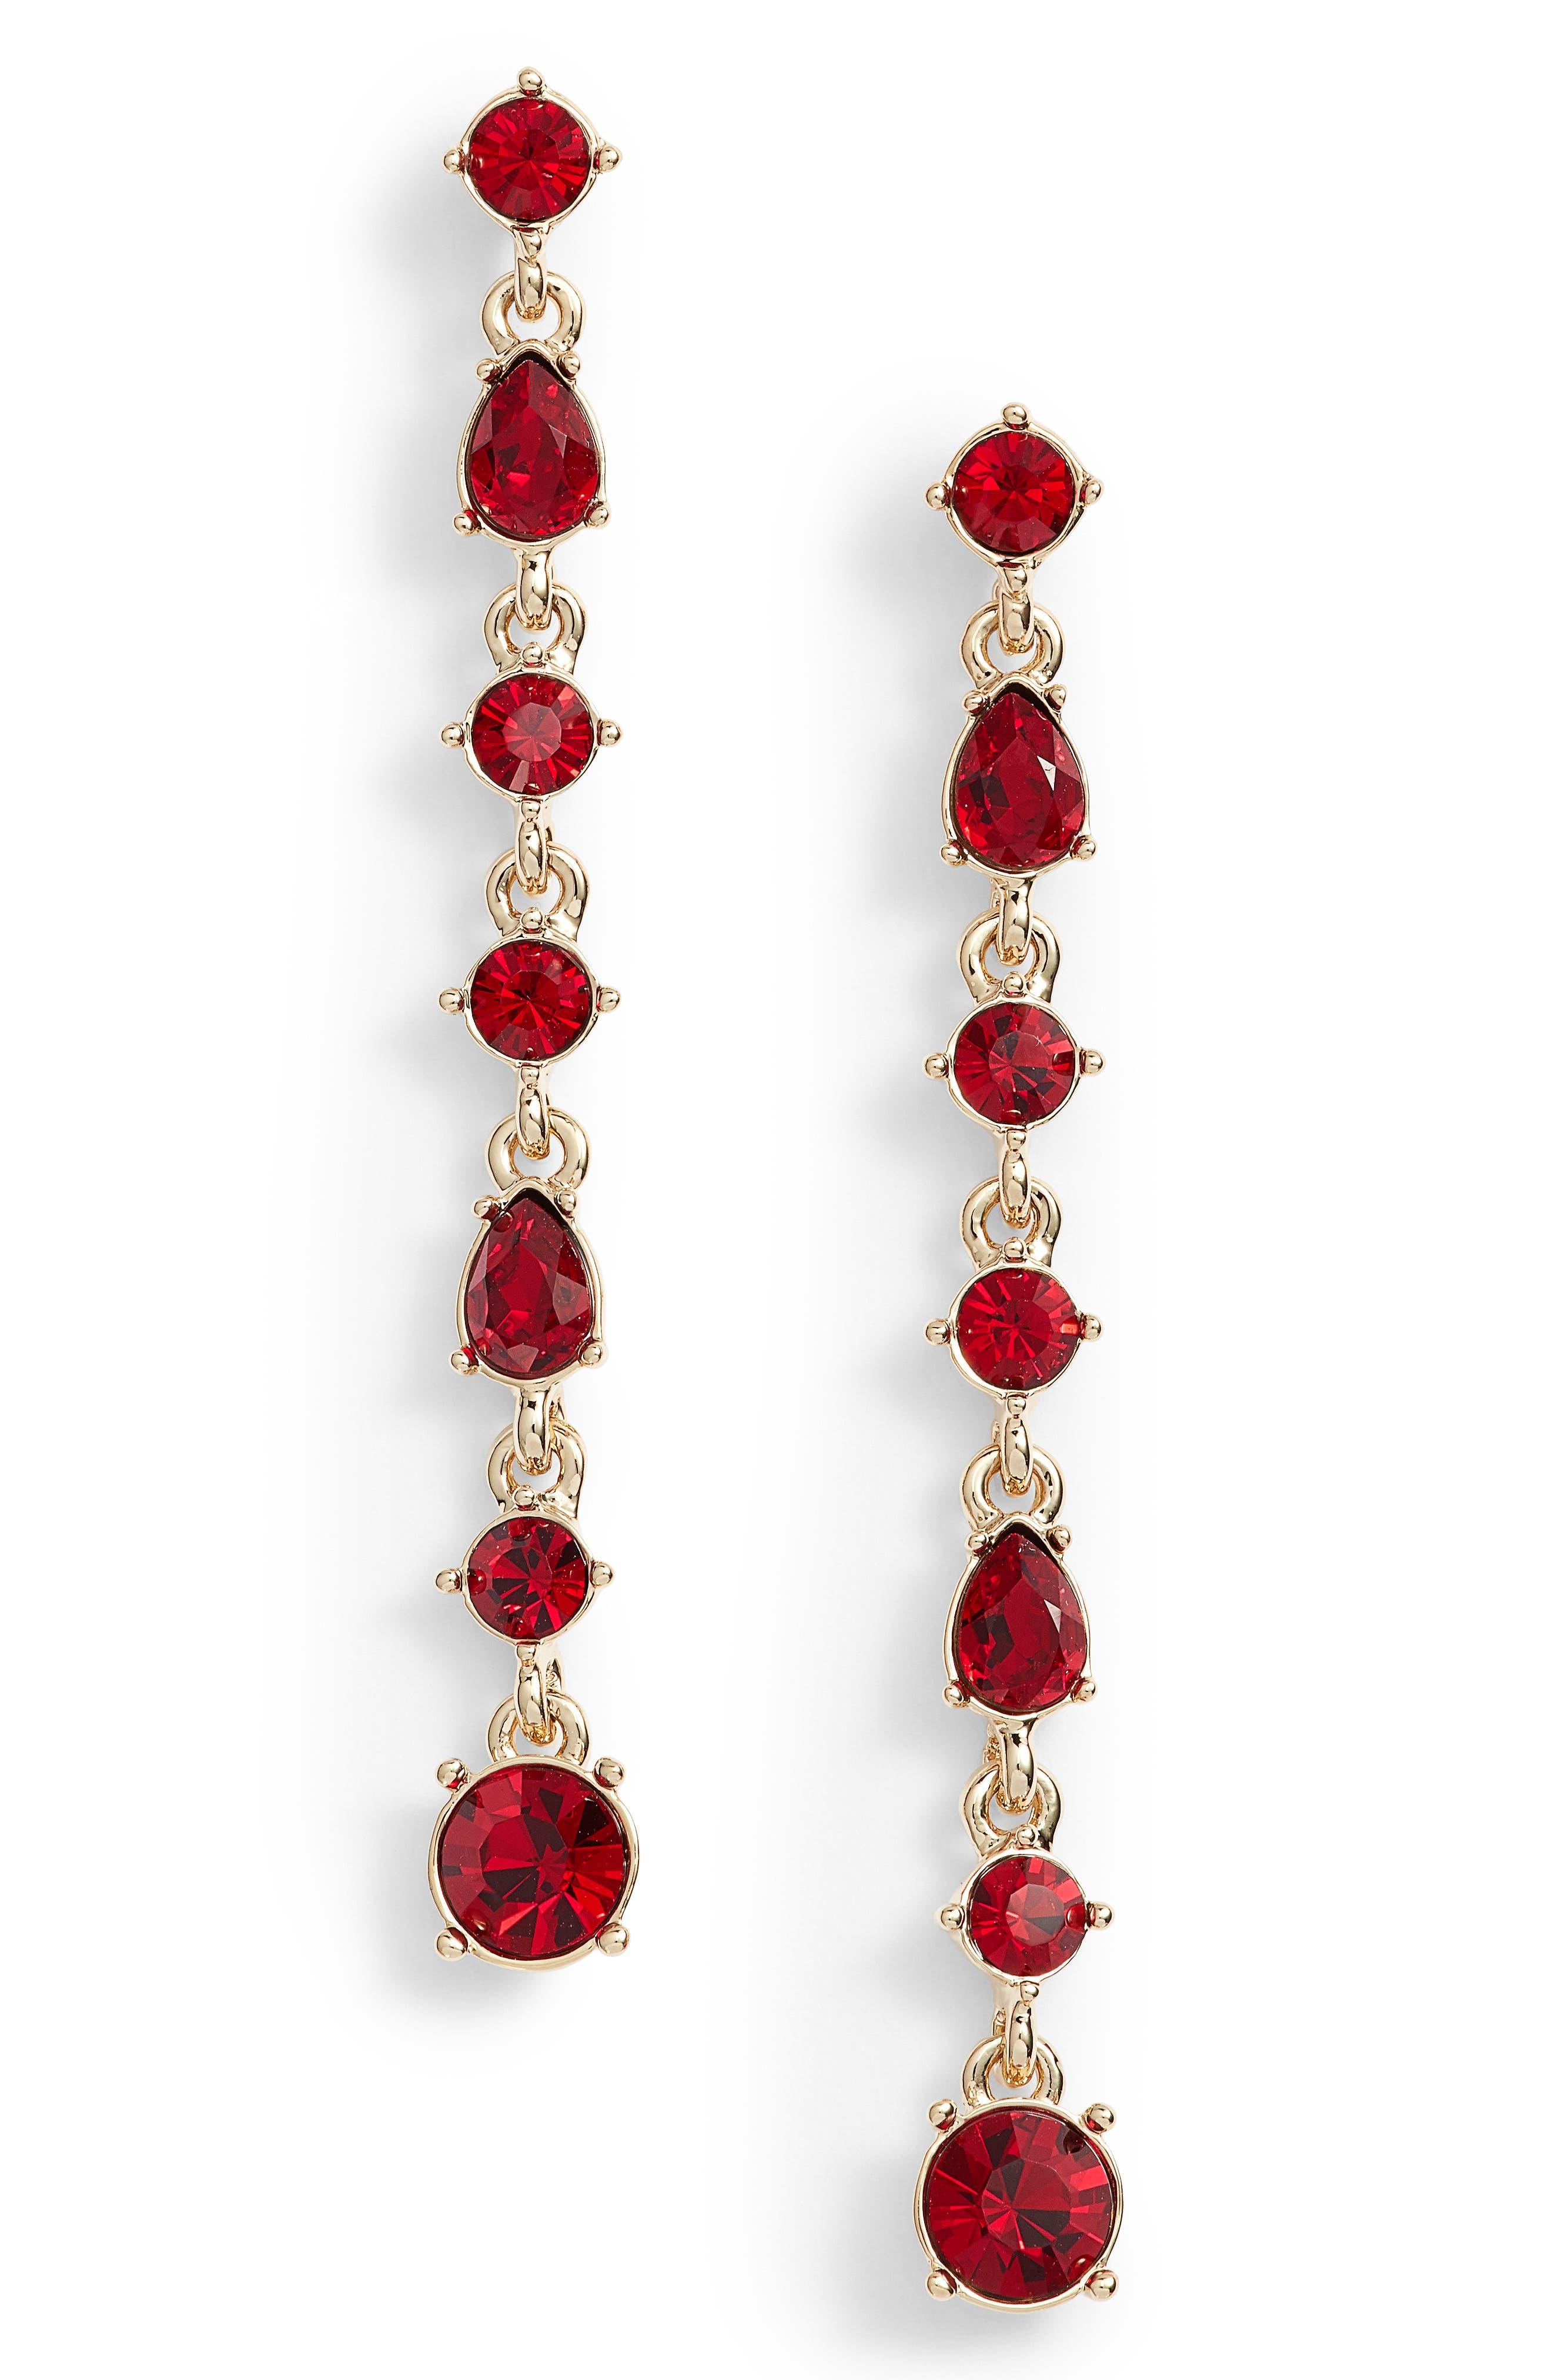 Givenchy Linear Drop Earrings